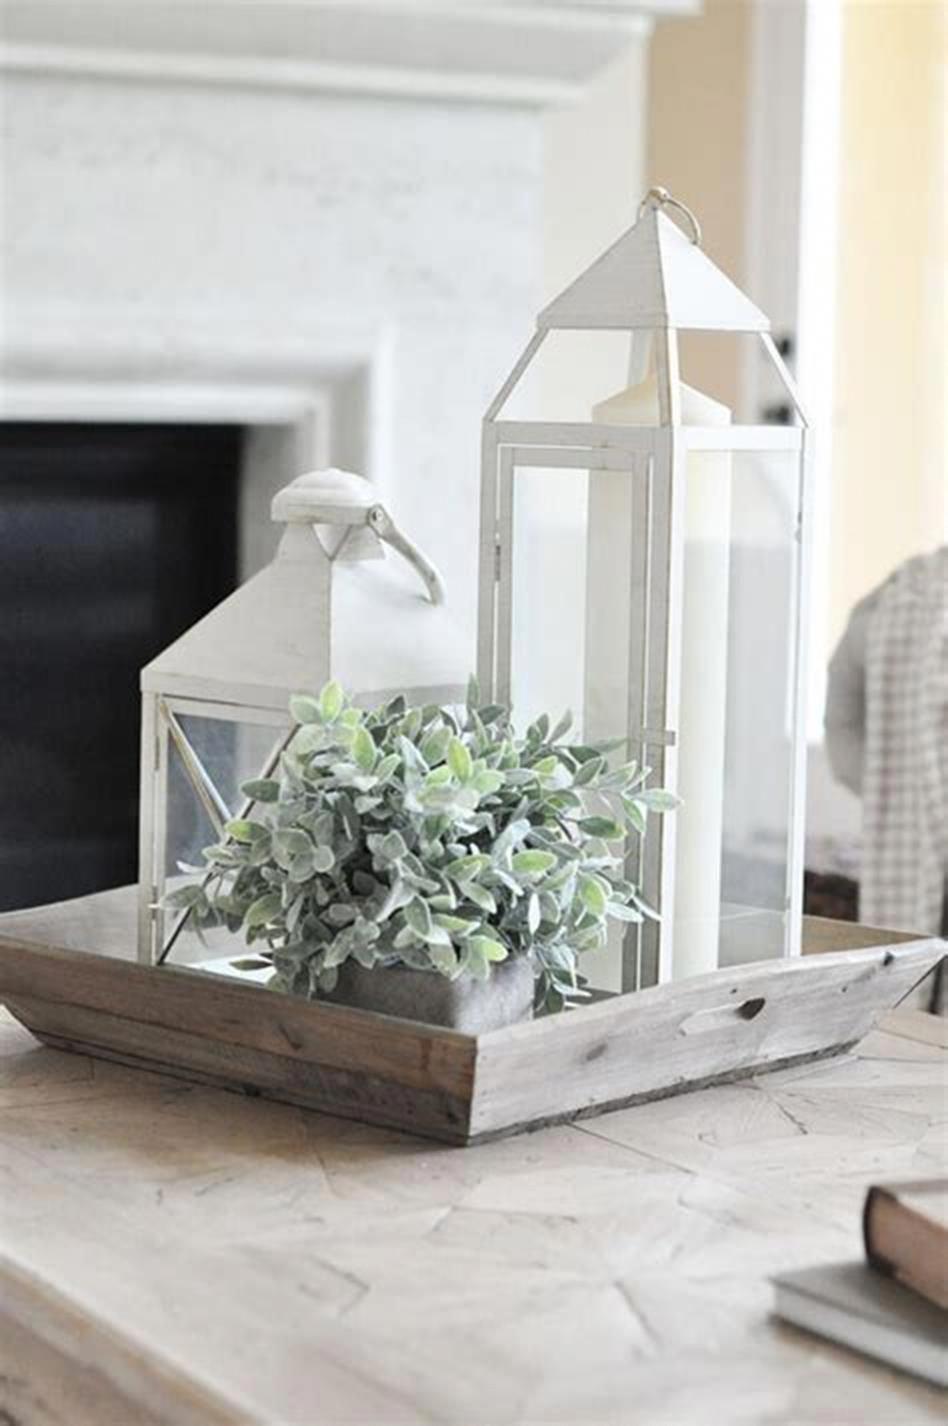 40 beautiful farmhouse style tray decor ideas 50